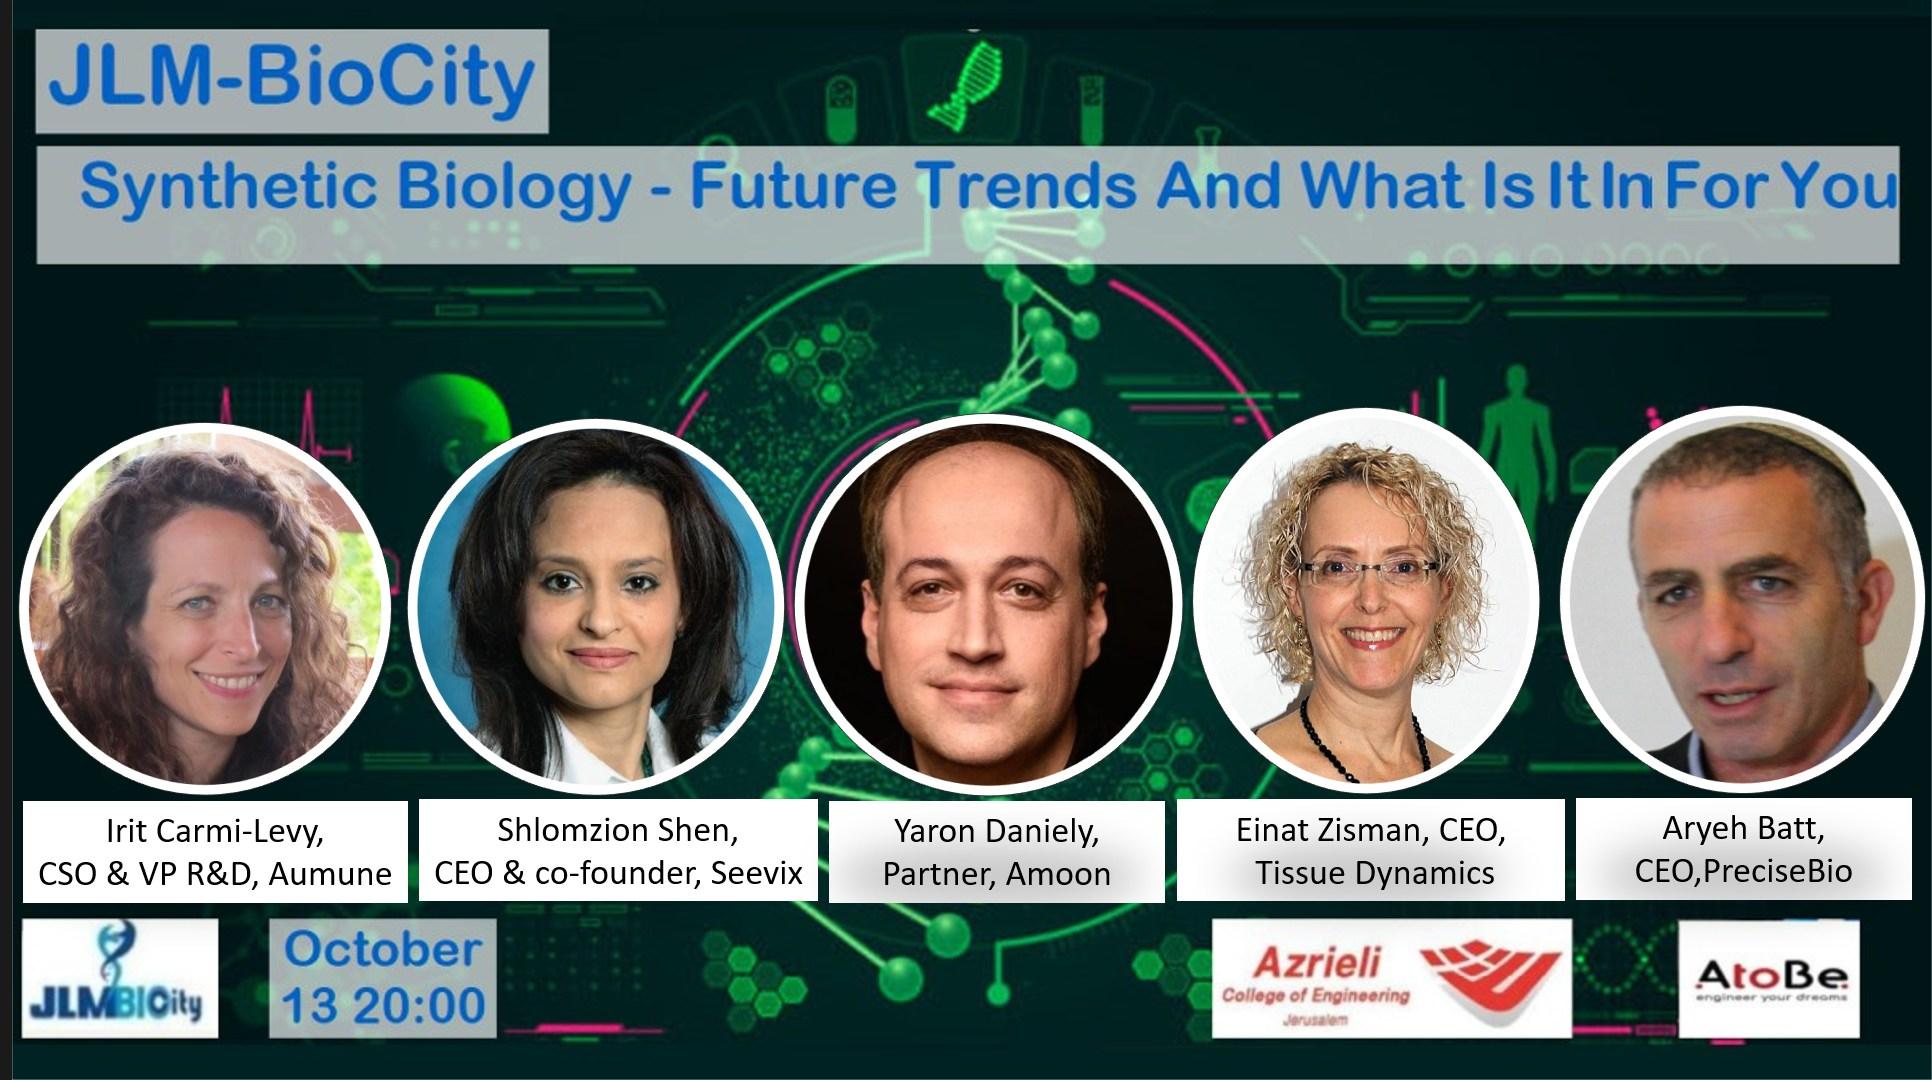 JLM-Biocity Event on Synthetic Biology